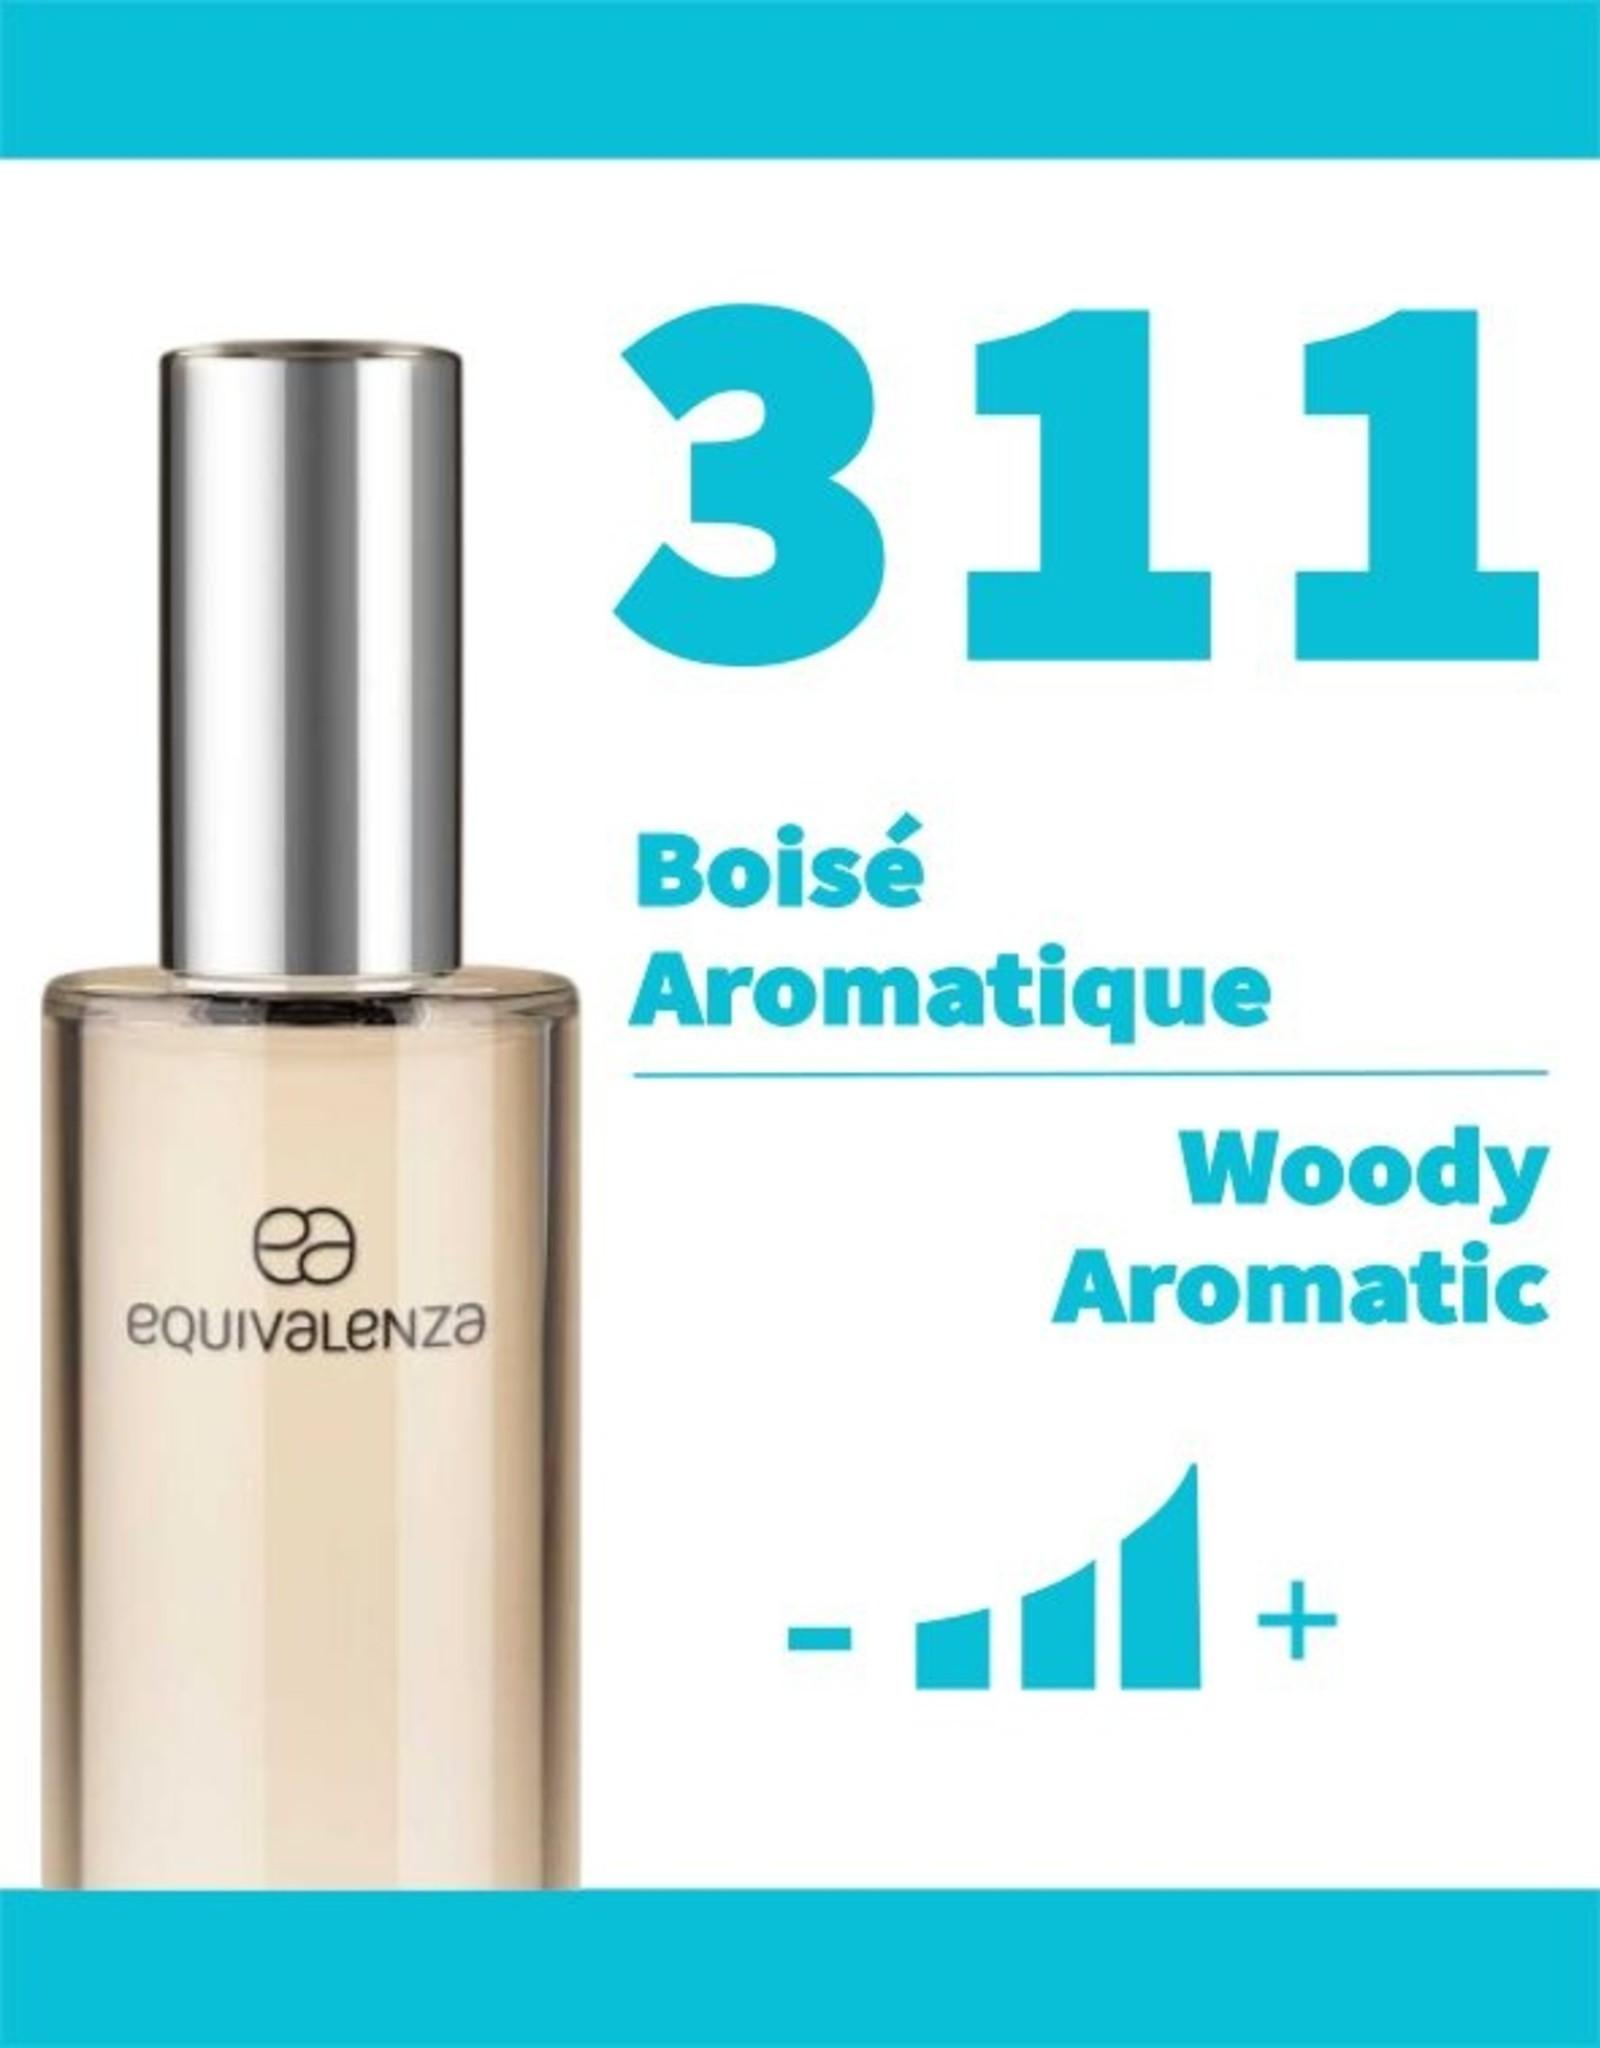 Equivalenza Woody Aromatic 311